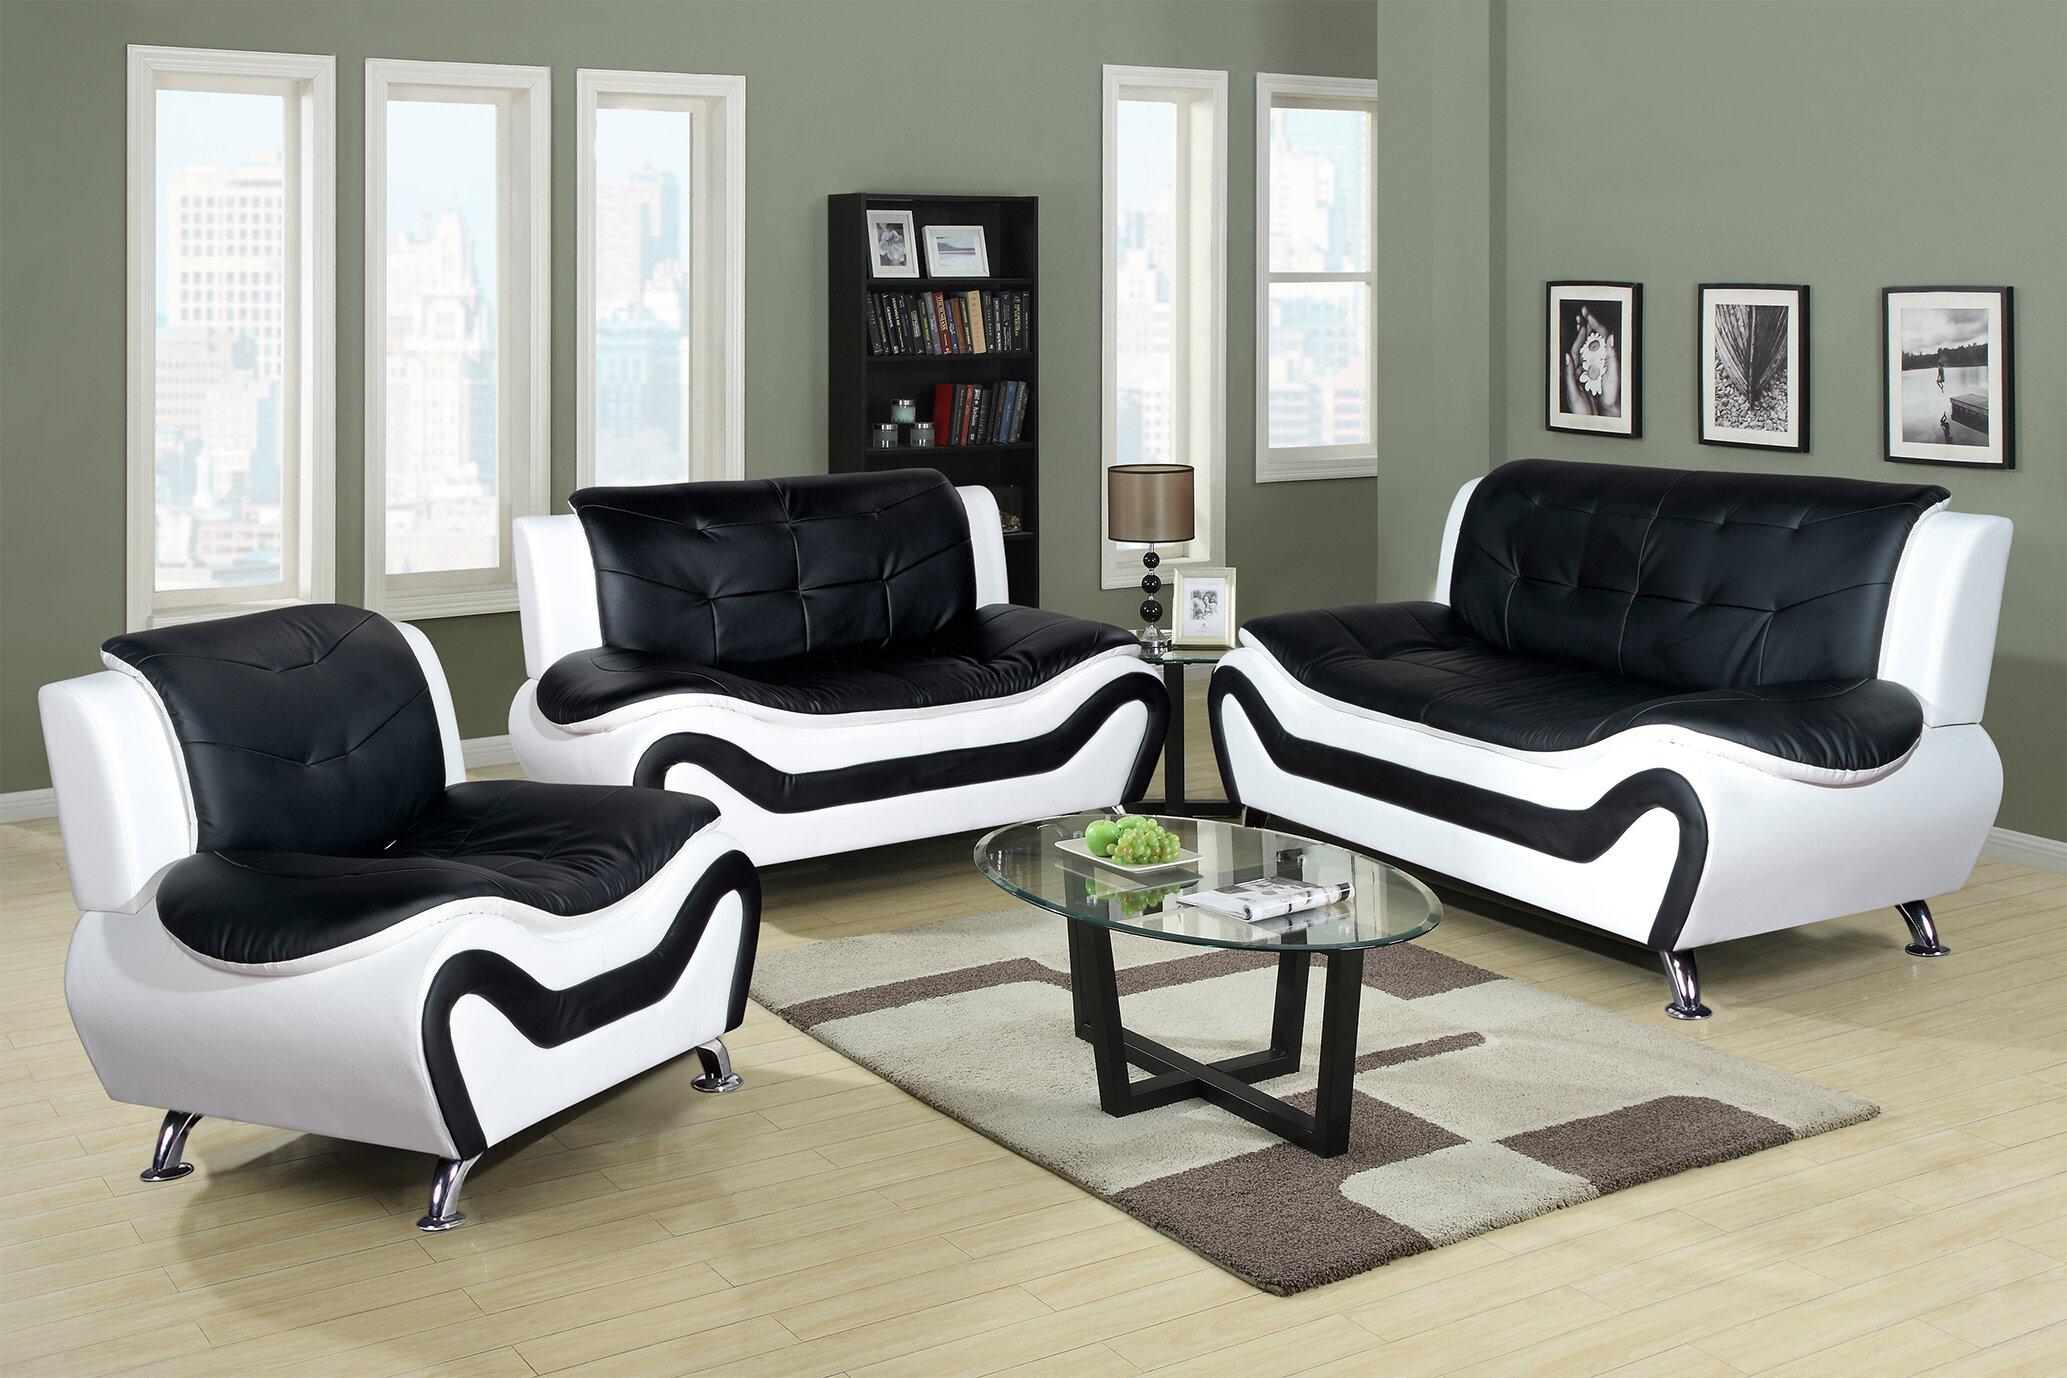 Chicoine 3 Piece Living Room Set